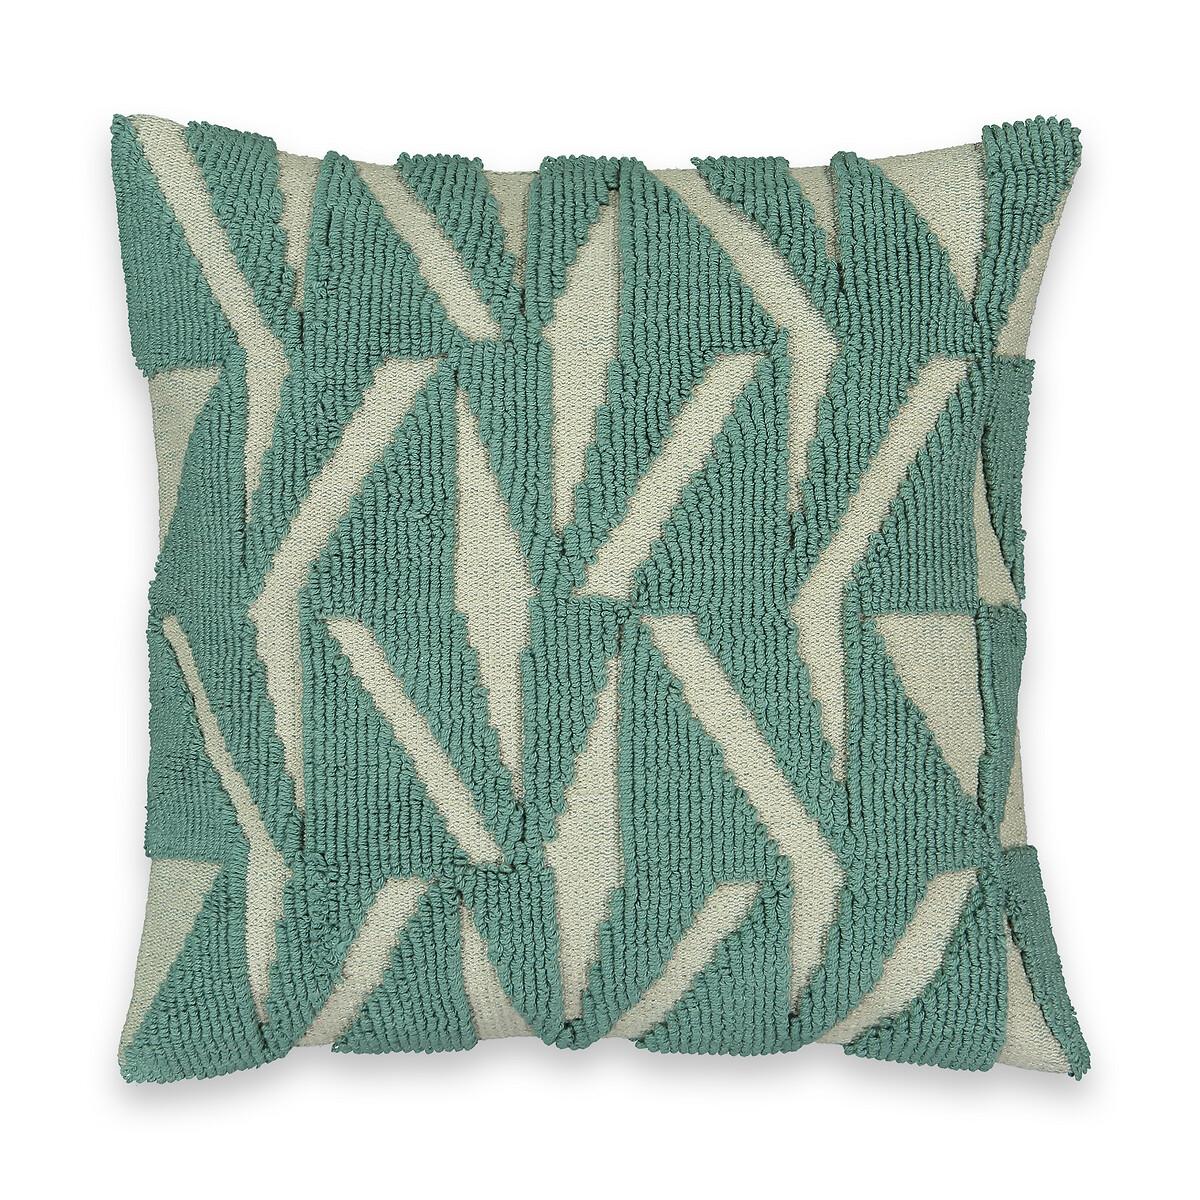 Чехол LaRedoute На подушку Mint 45 x 45 см зеленый